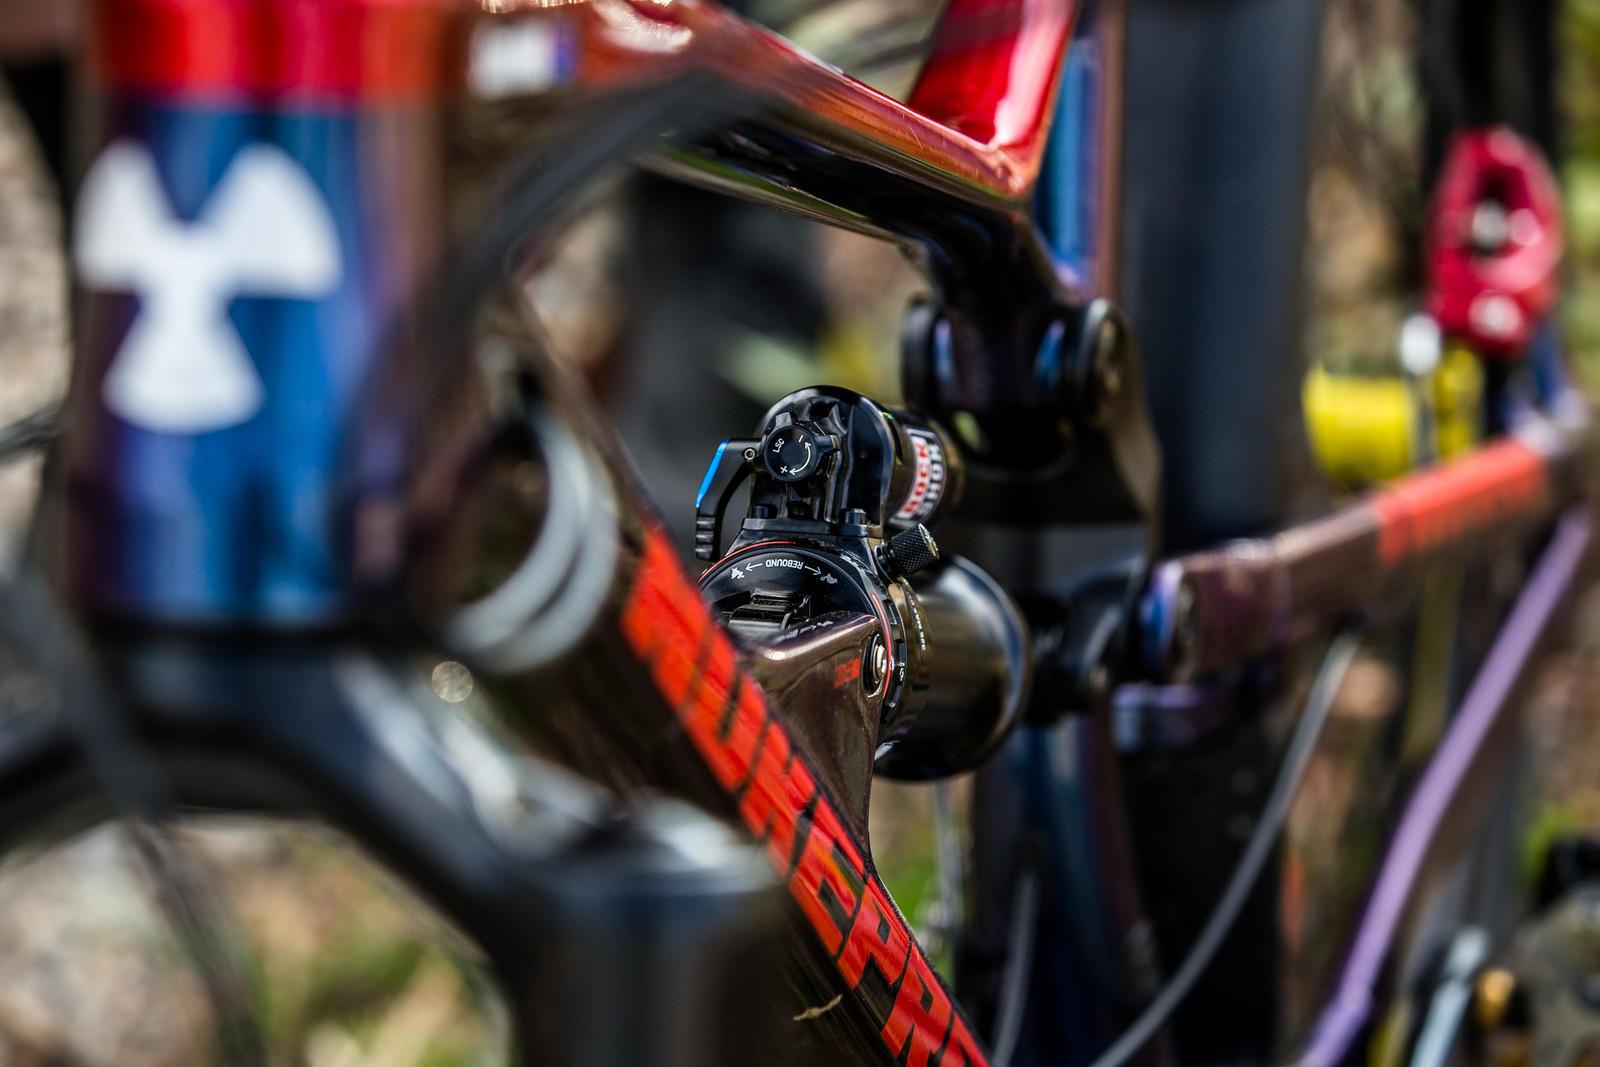 RockShox SuperDeluxe - WINNING BIKE - Sam Hill's Nukeproof Mega 275 - Mountain Biking Pictures - Vital MTB